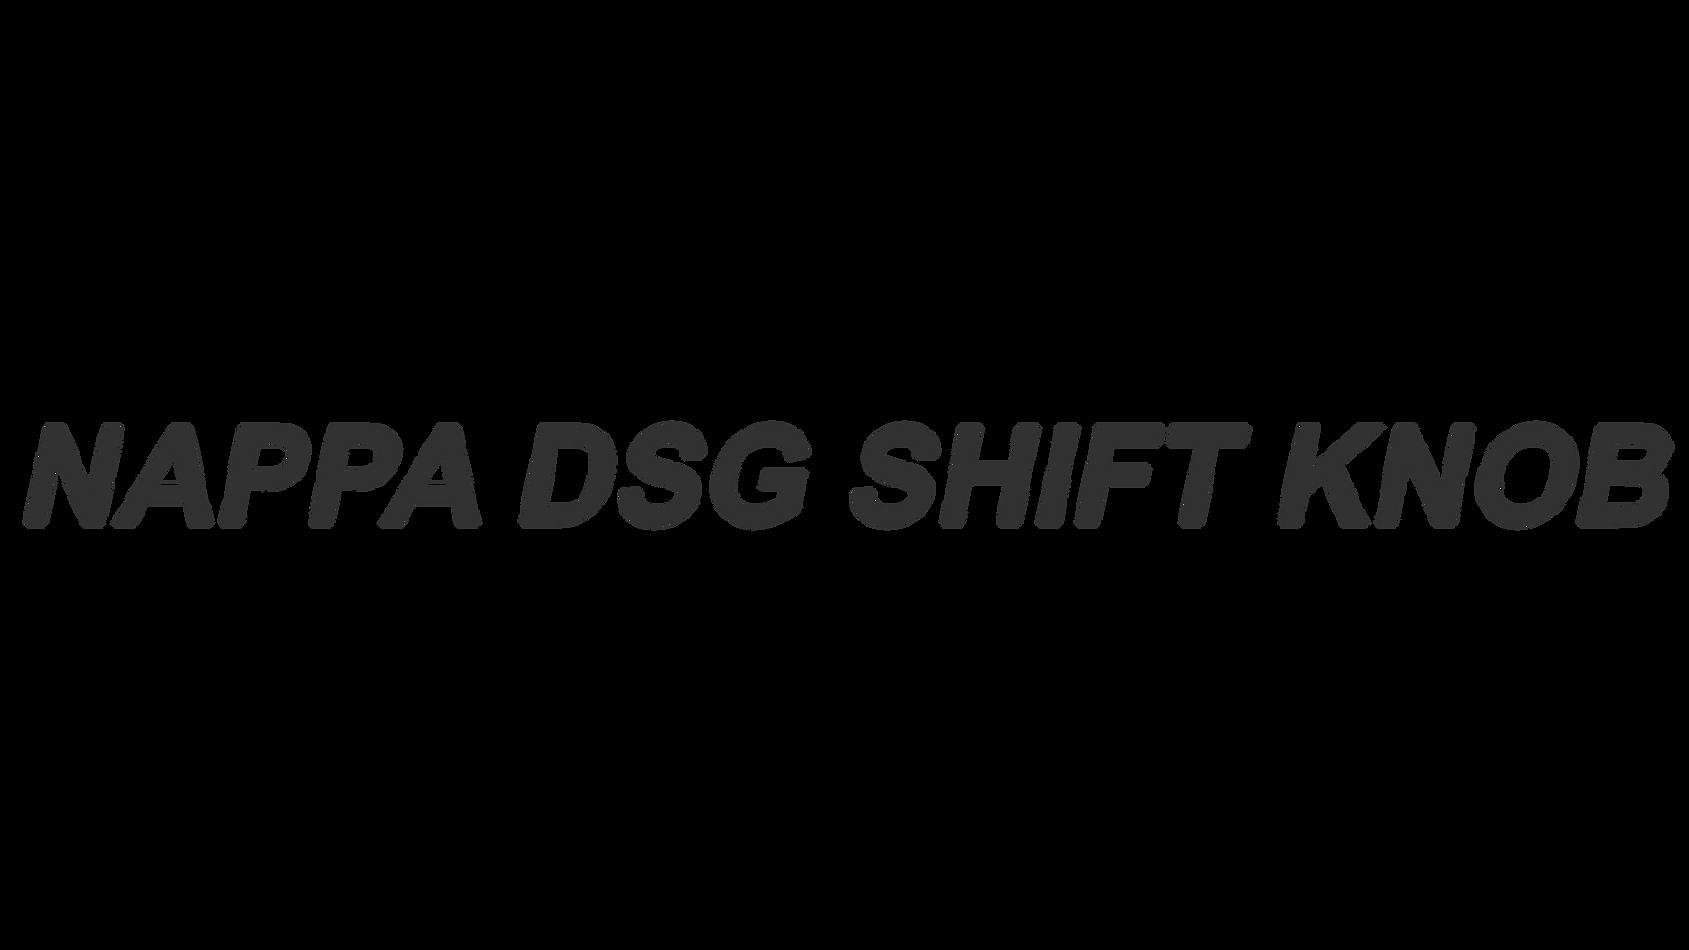 Nappa DSG Shift Knob06.png